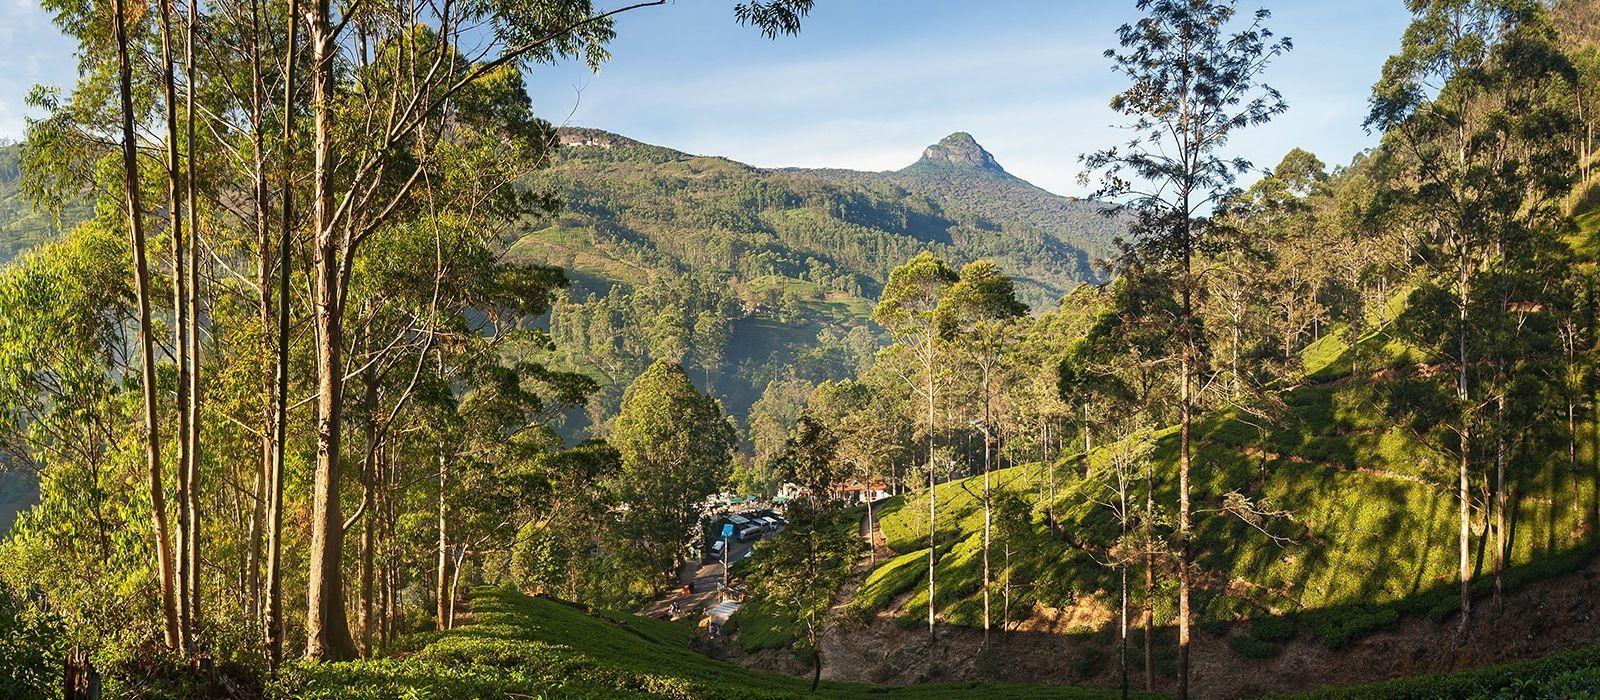 Reiseziel Adam's Peak Sri Lanka